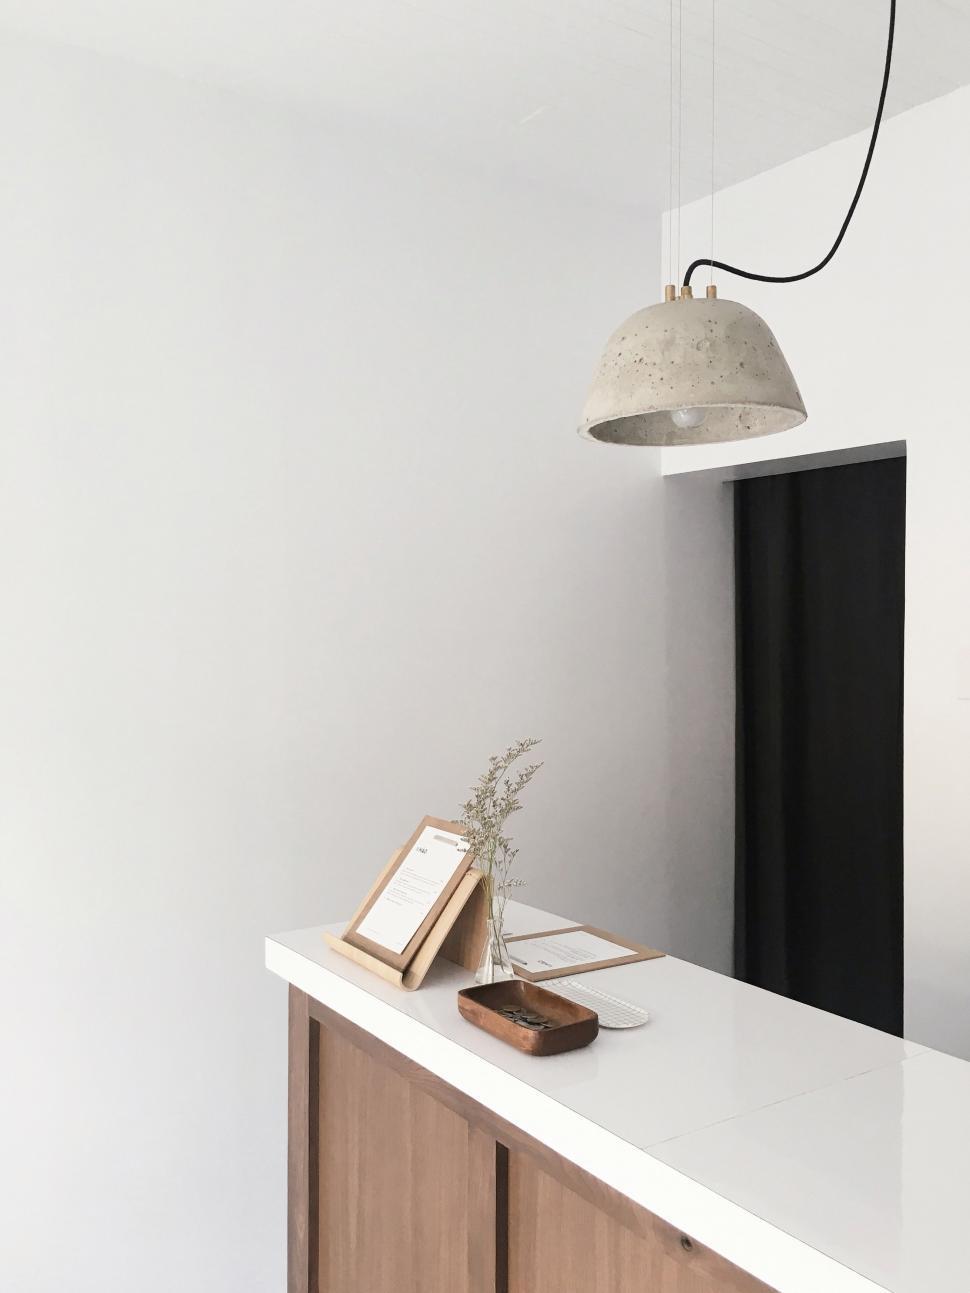 Download Free Stock Photo of table lamp lamp furniture washbasin basin furnishing